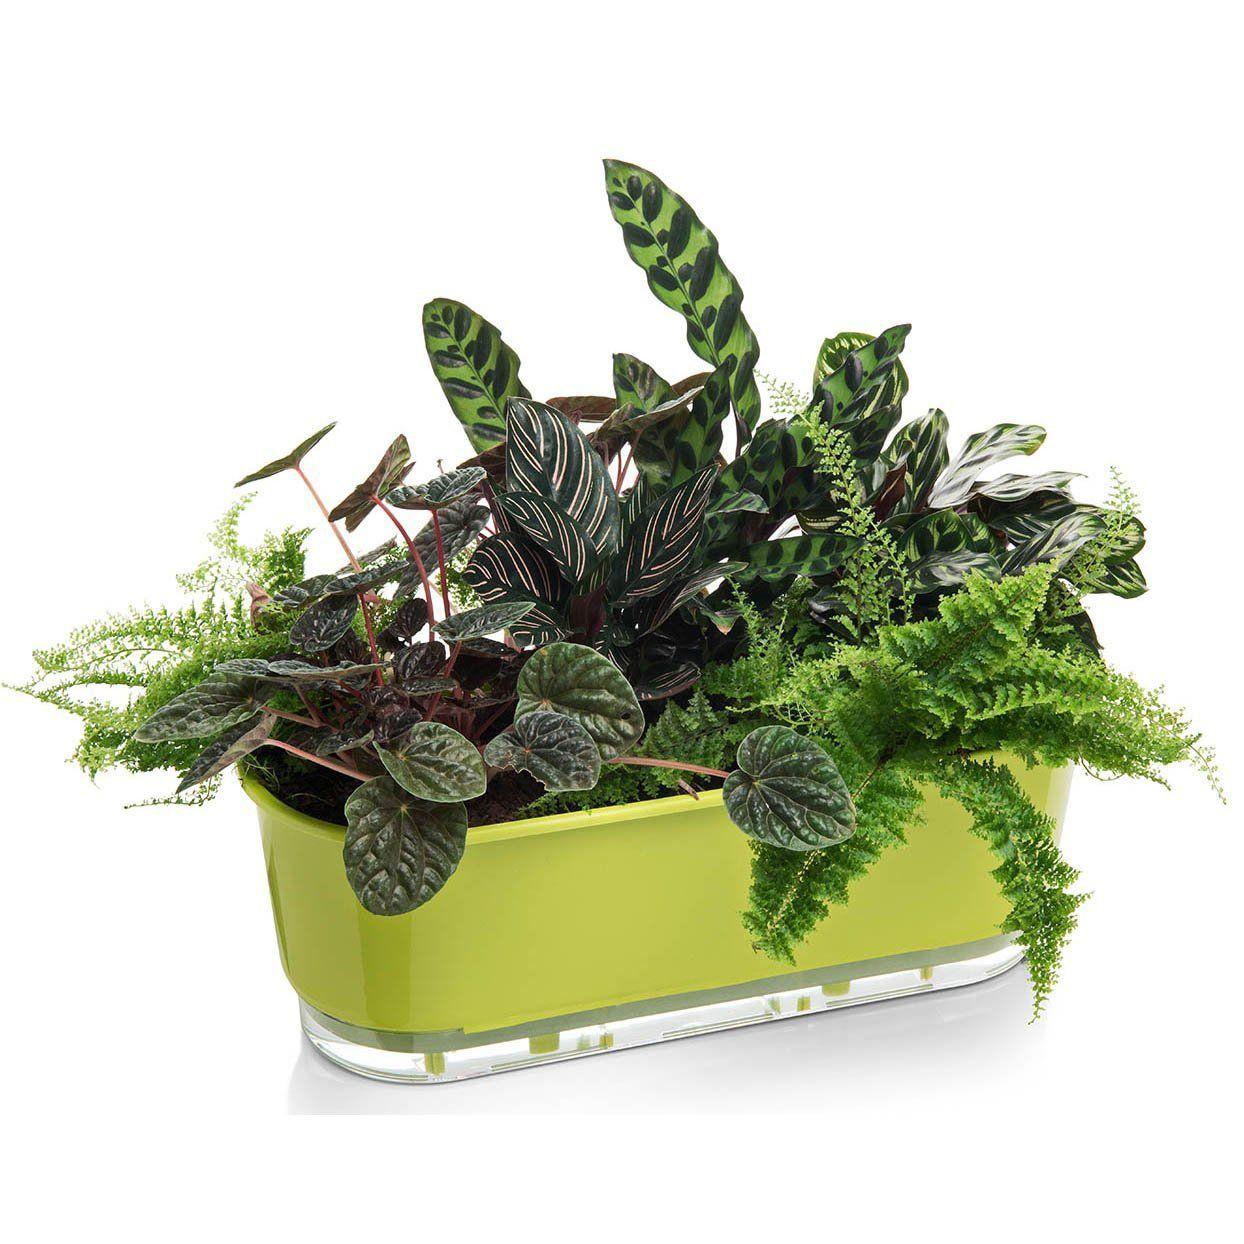 Vaso Autoirrigável Jardineira Verde Claro 40cm Raiz